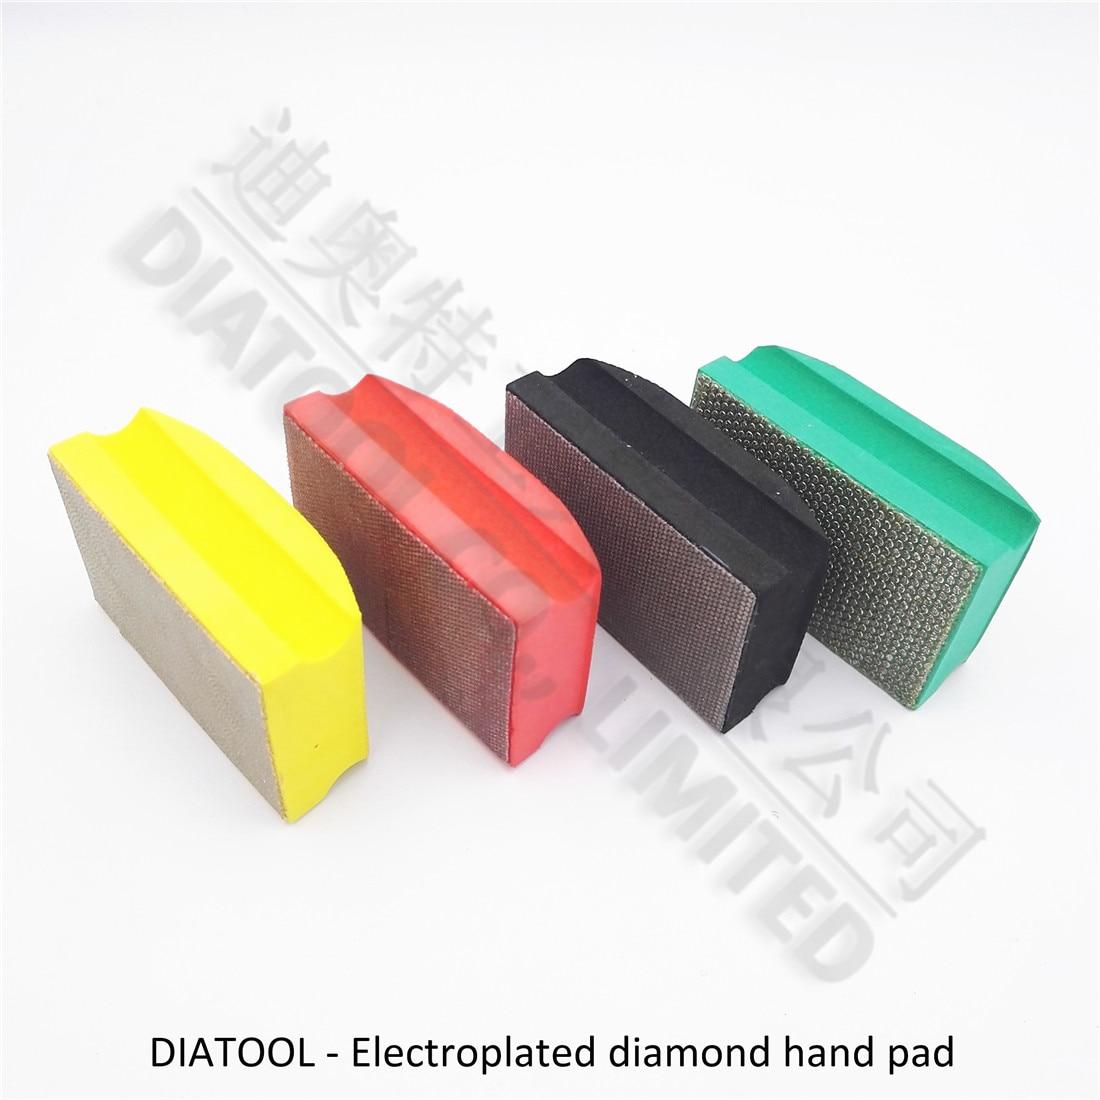 DIATOOL 2pcs Dotted Electroplated Diamond Hand Polishing Pad 90X55MM Hard Foam-backed Hand Pad